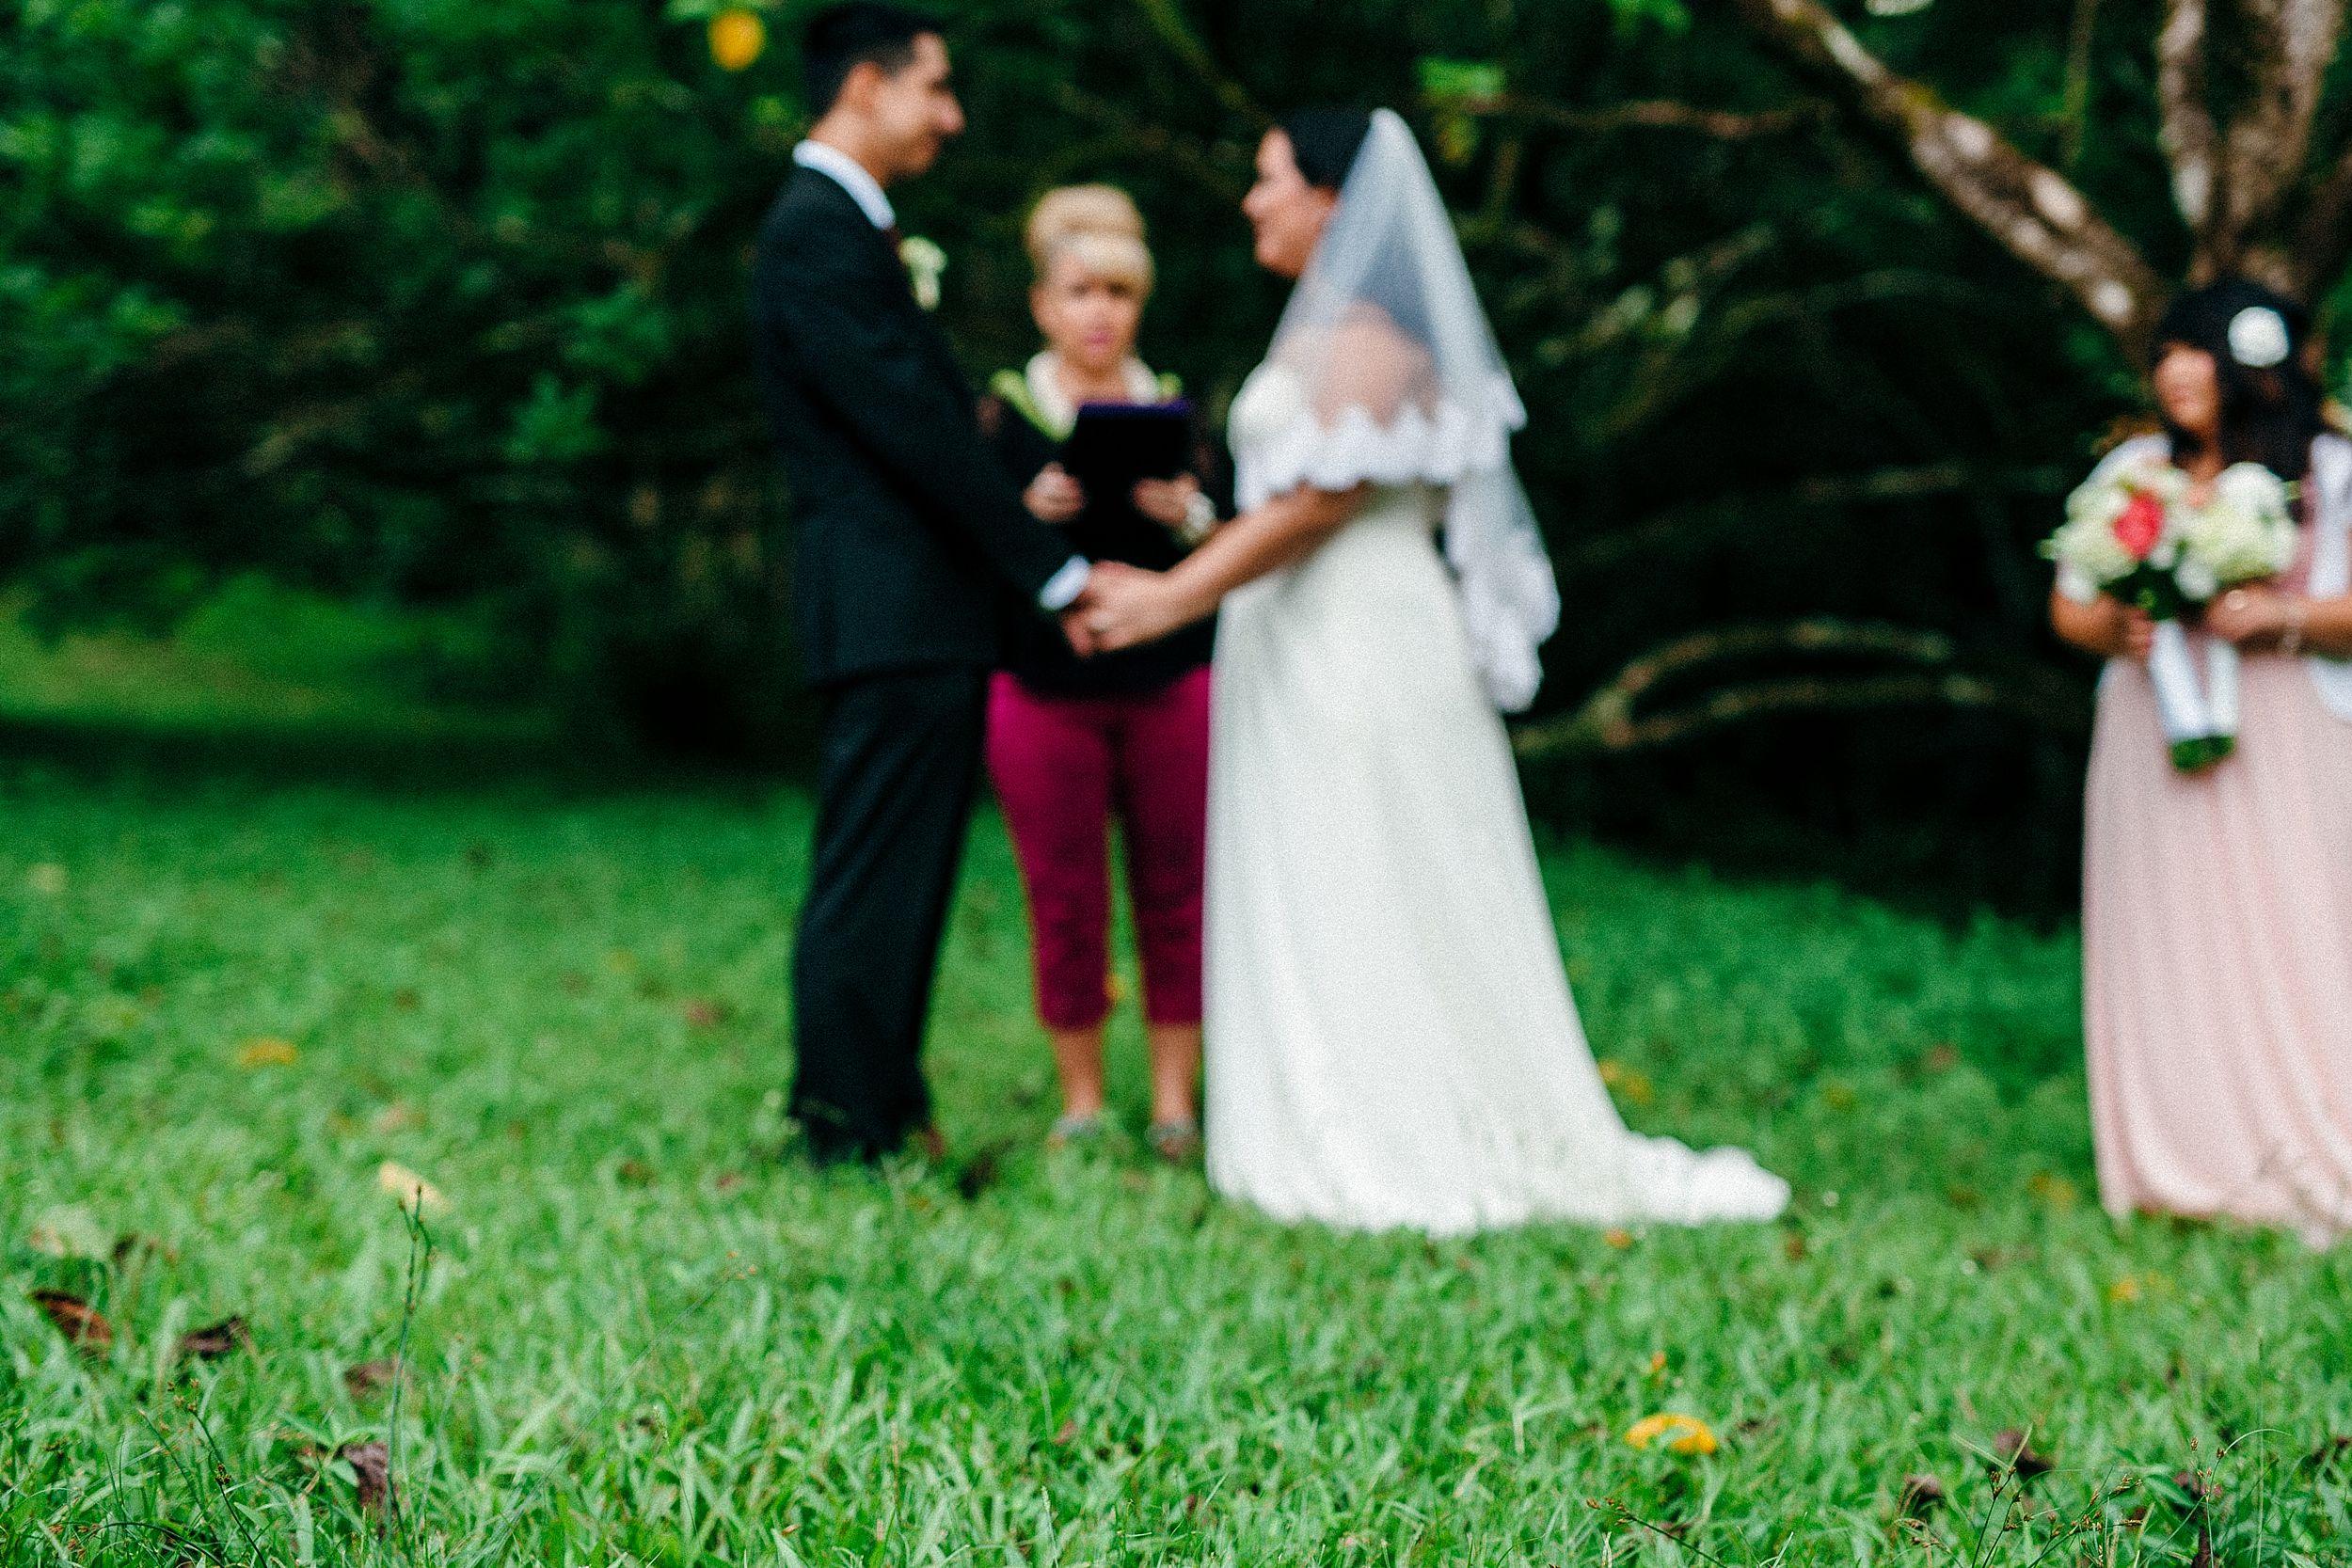 Ho'omaluhia Mountain Wedding - A Small Hawaii Elopement